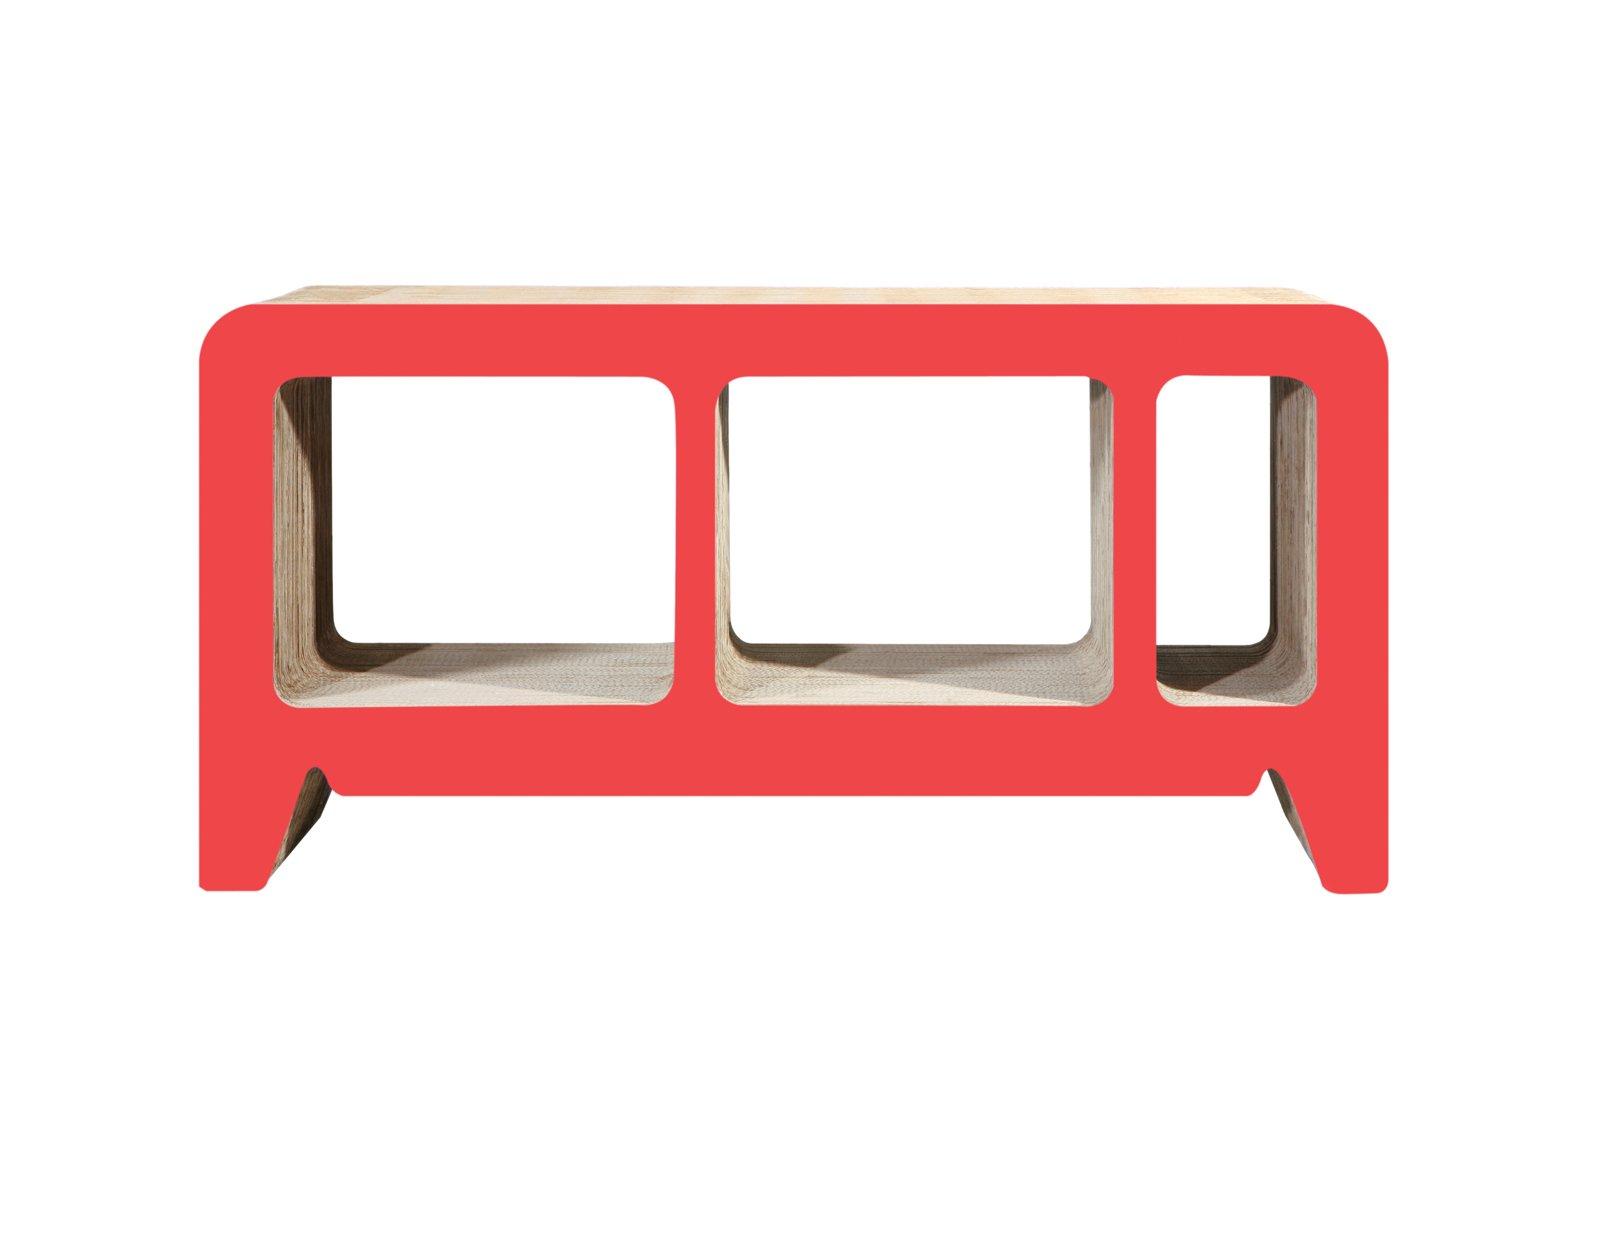 "Georgia Sideboard by Reinhard Dienes  Search ""전주오피《《www.MAT55.com》》⊀달밤⊁대비∥전주오피ಓ전주룸사롱ꌛ전주출장ꌙ전주Hugetelꏎ전주업소✘전주안마"" from Outside the Box: Cardboard Design"